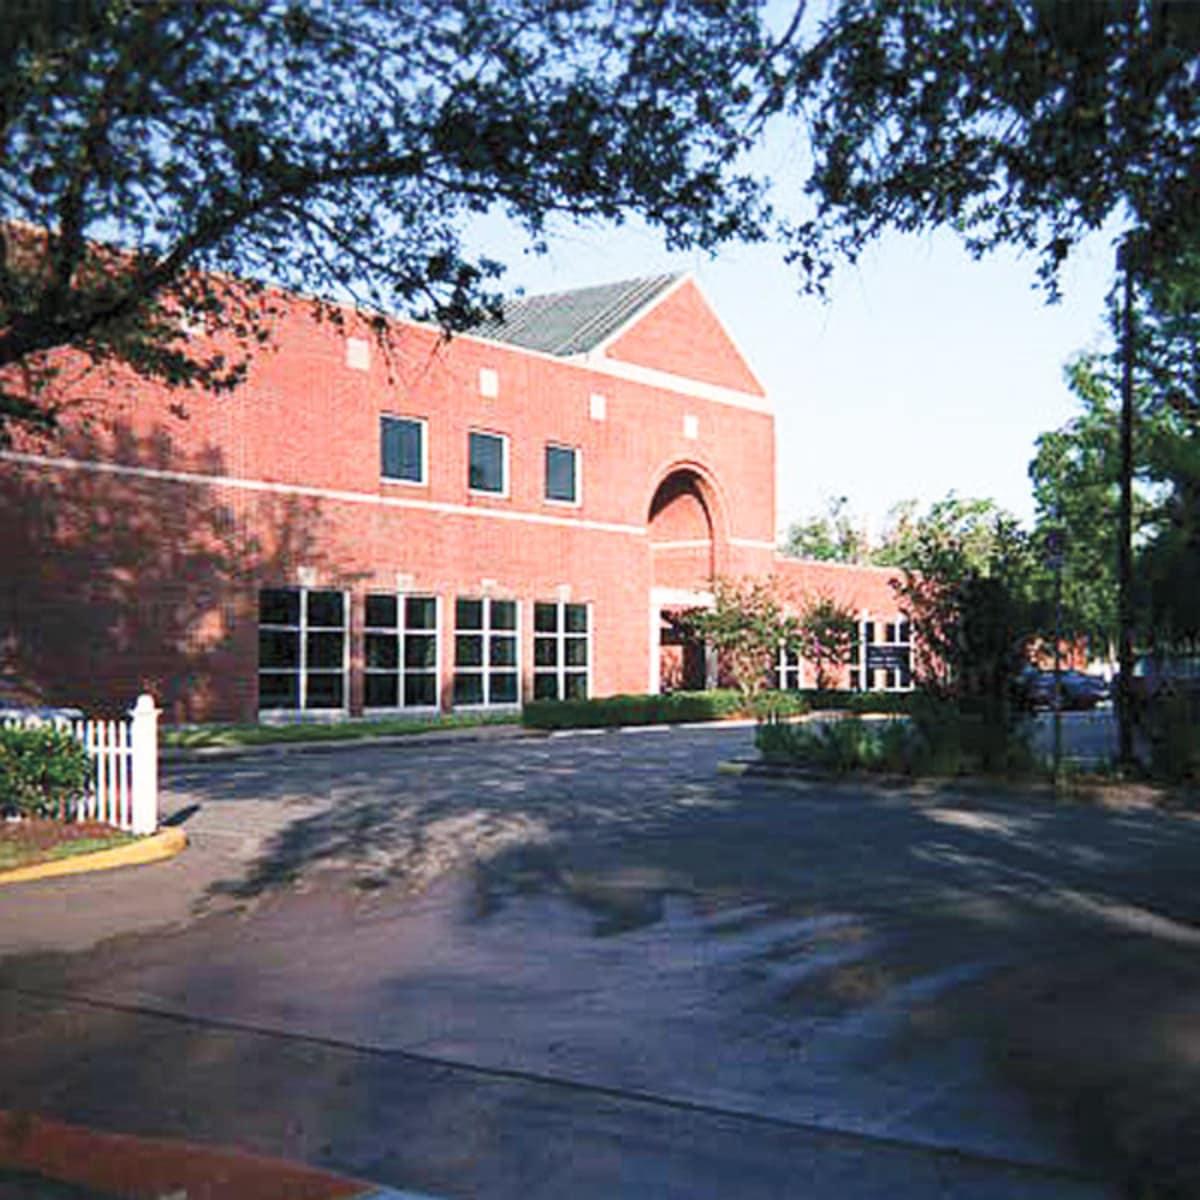 Places-Unique-Clayton Library exterior